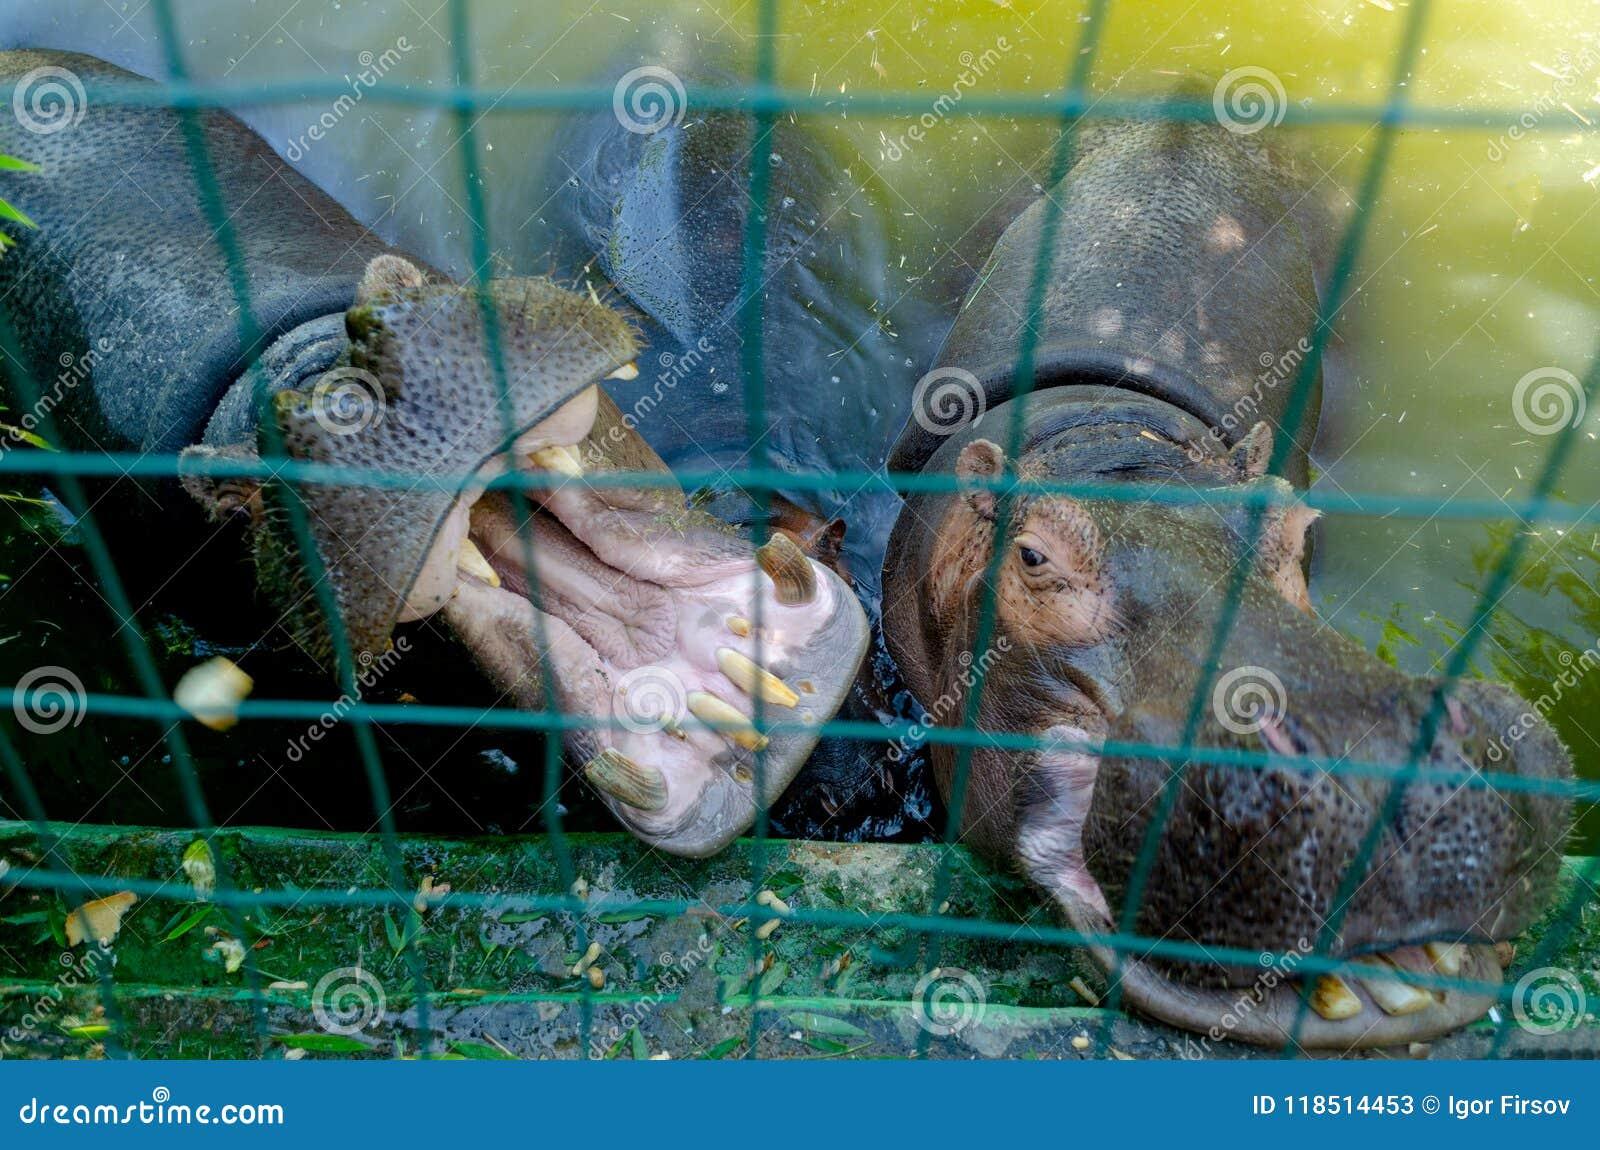 Hippopotamus in the pool frica, nature, animal, wildlife lake park